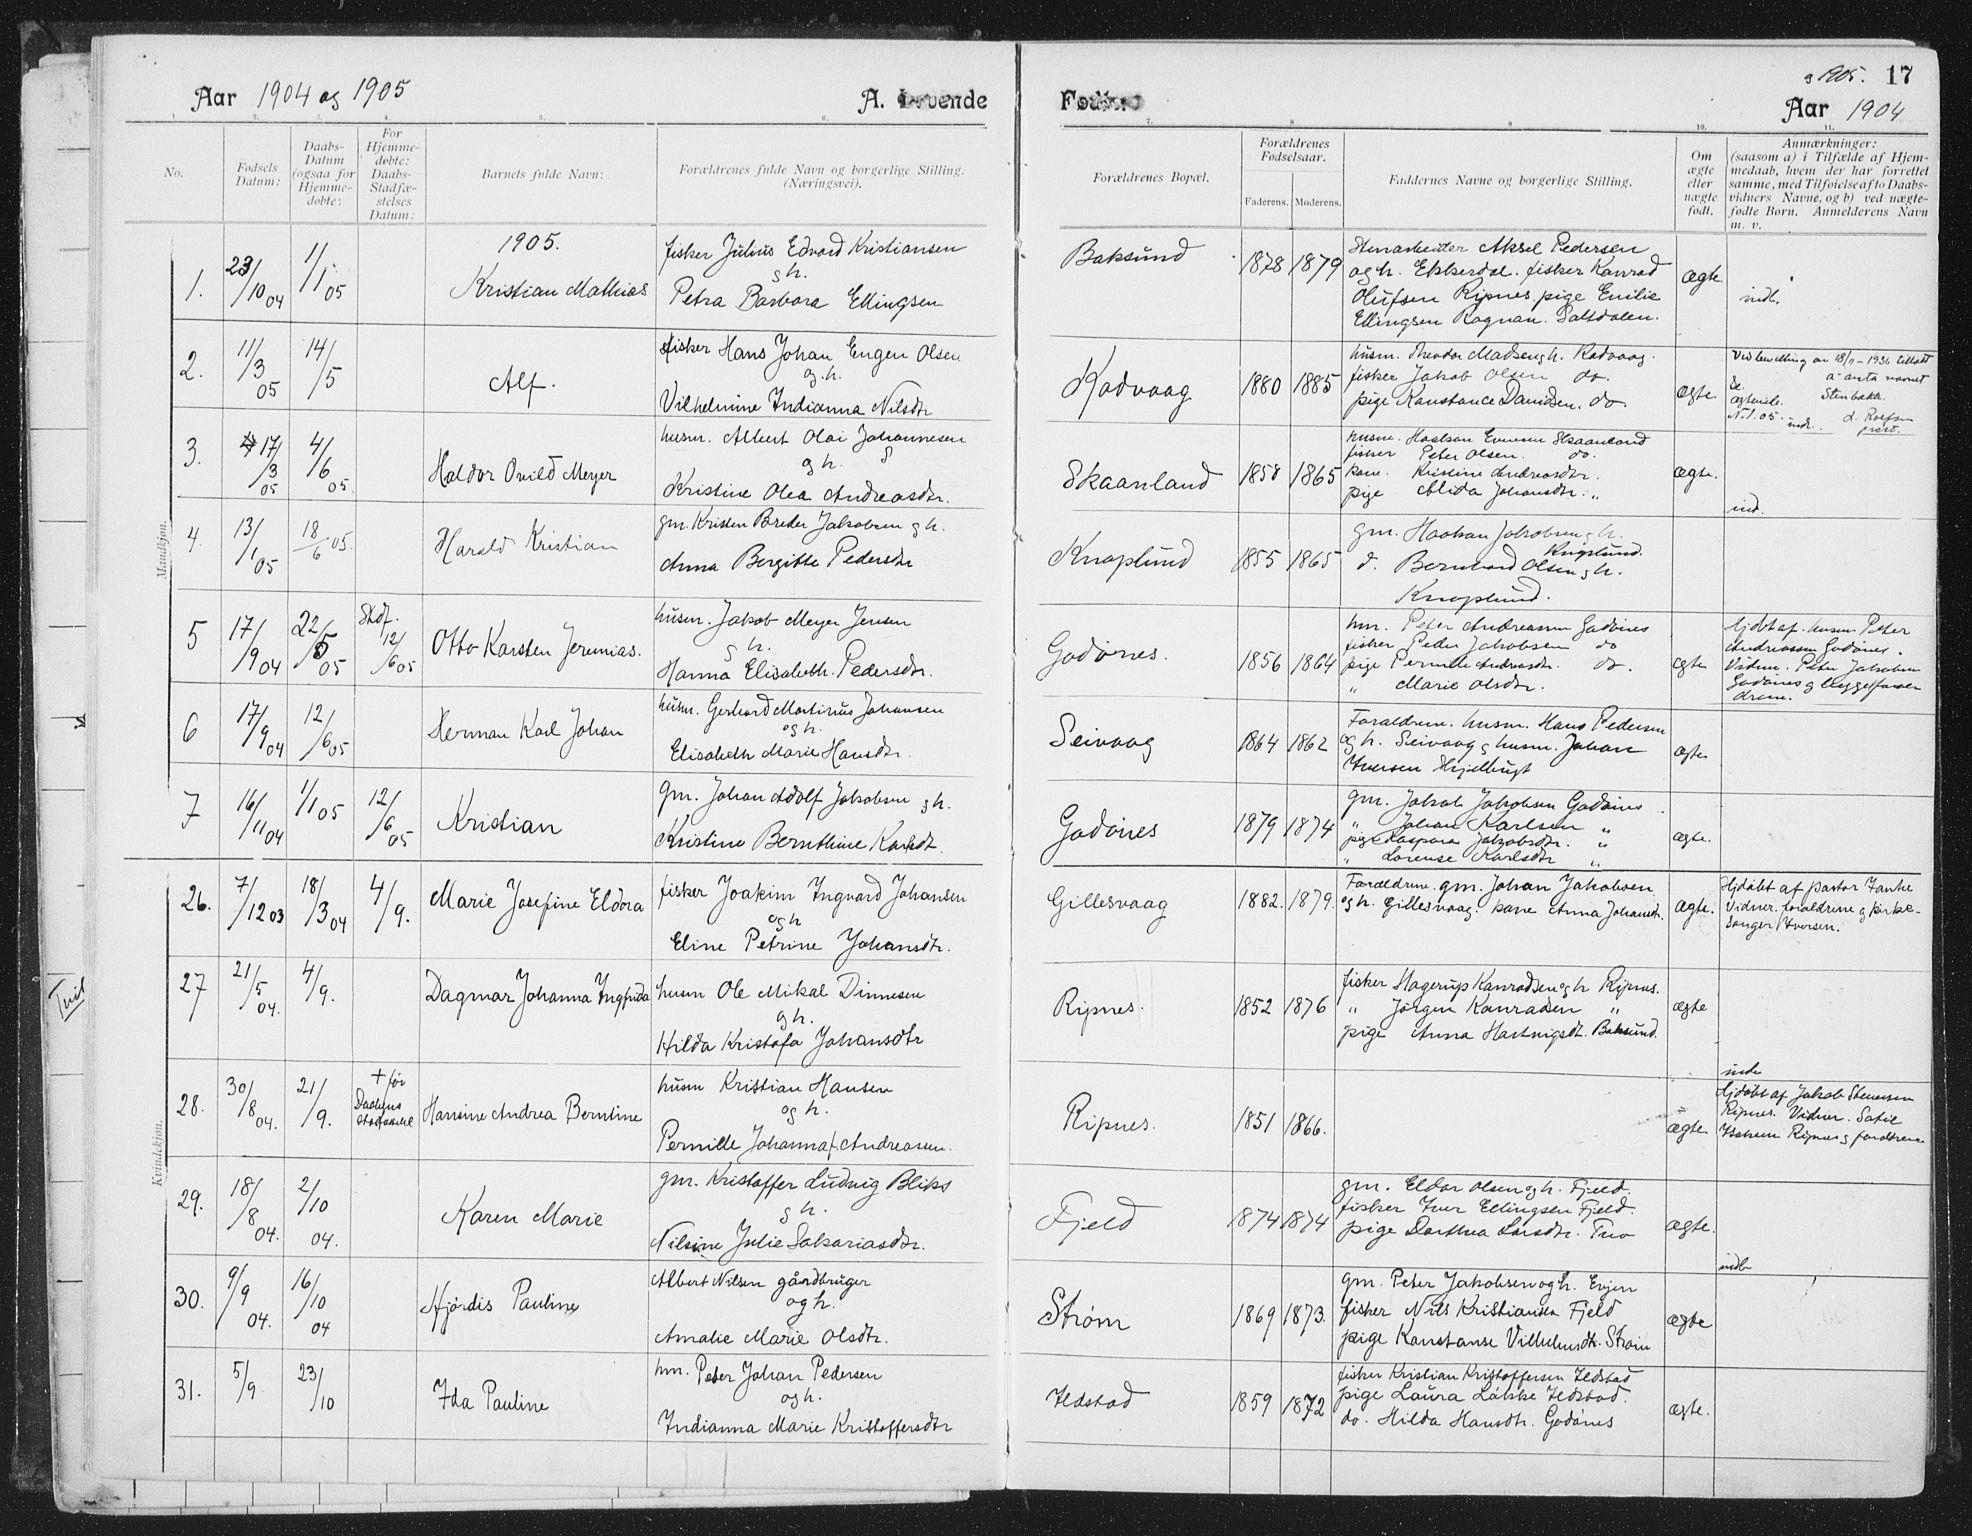 SAT, Ministerialprotokoller, klokkerbøker og fødselsregistre - Nordland, 804/L0081: Ministerialbok nr. 804A02, 1901-1915, s. 17